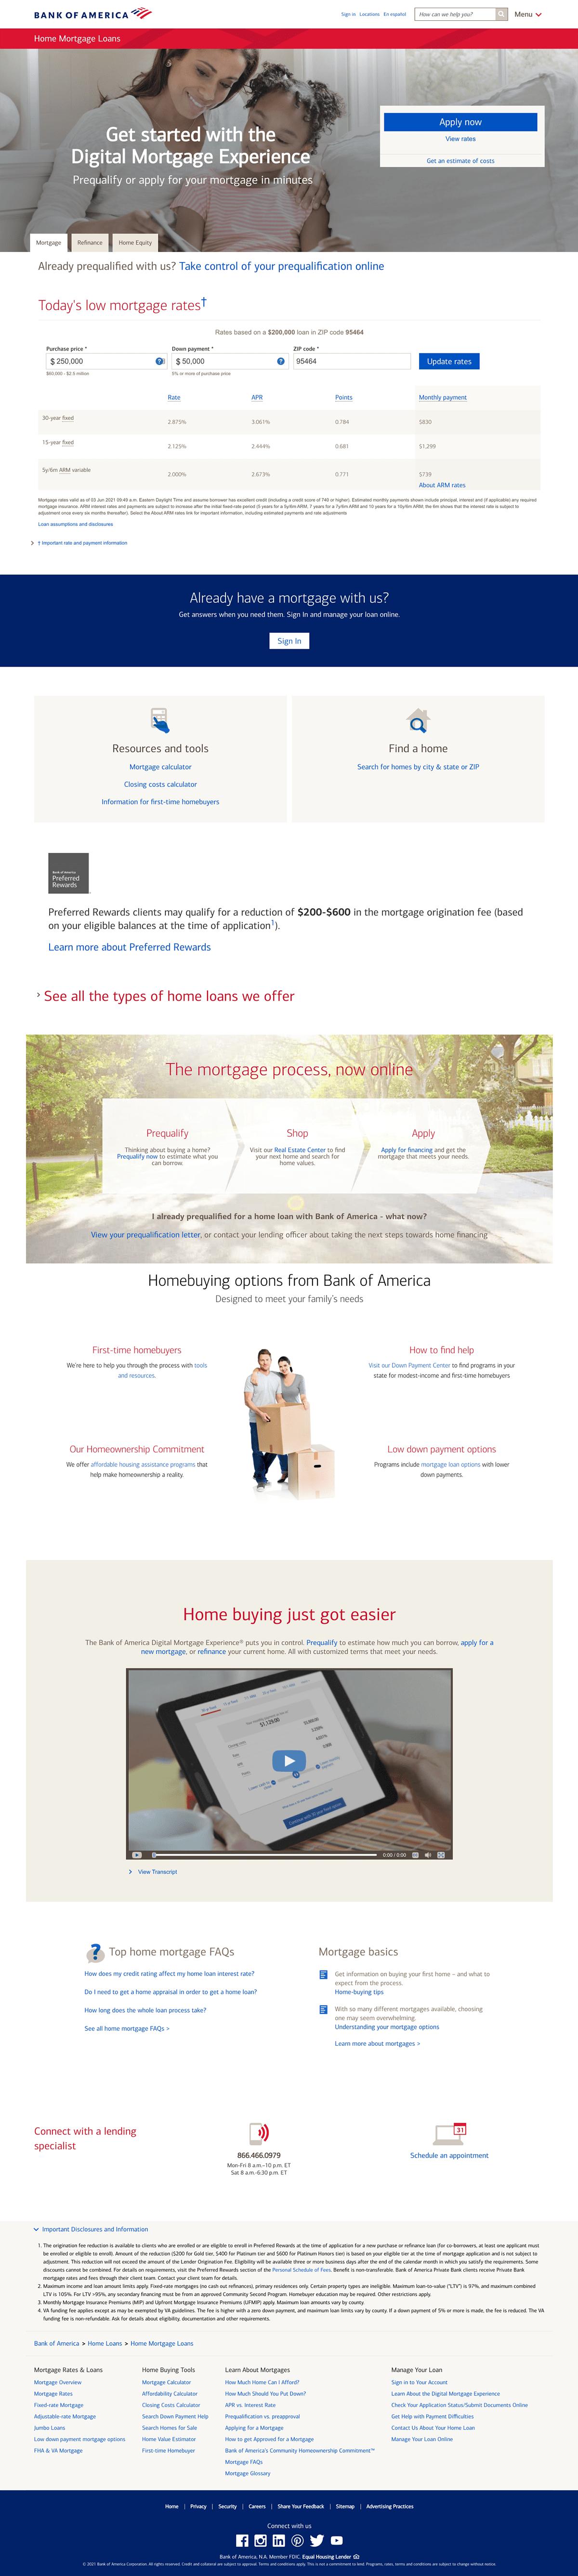 Bank of America Mortgage Landing Page